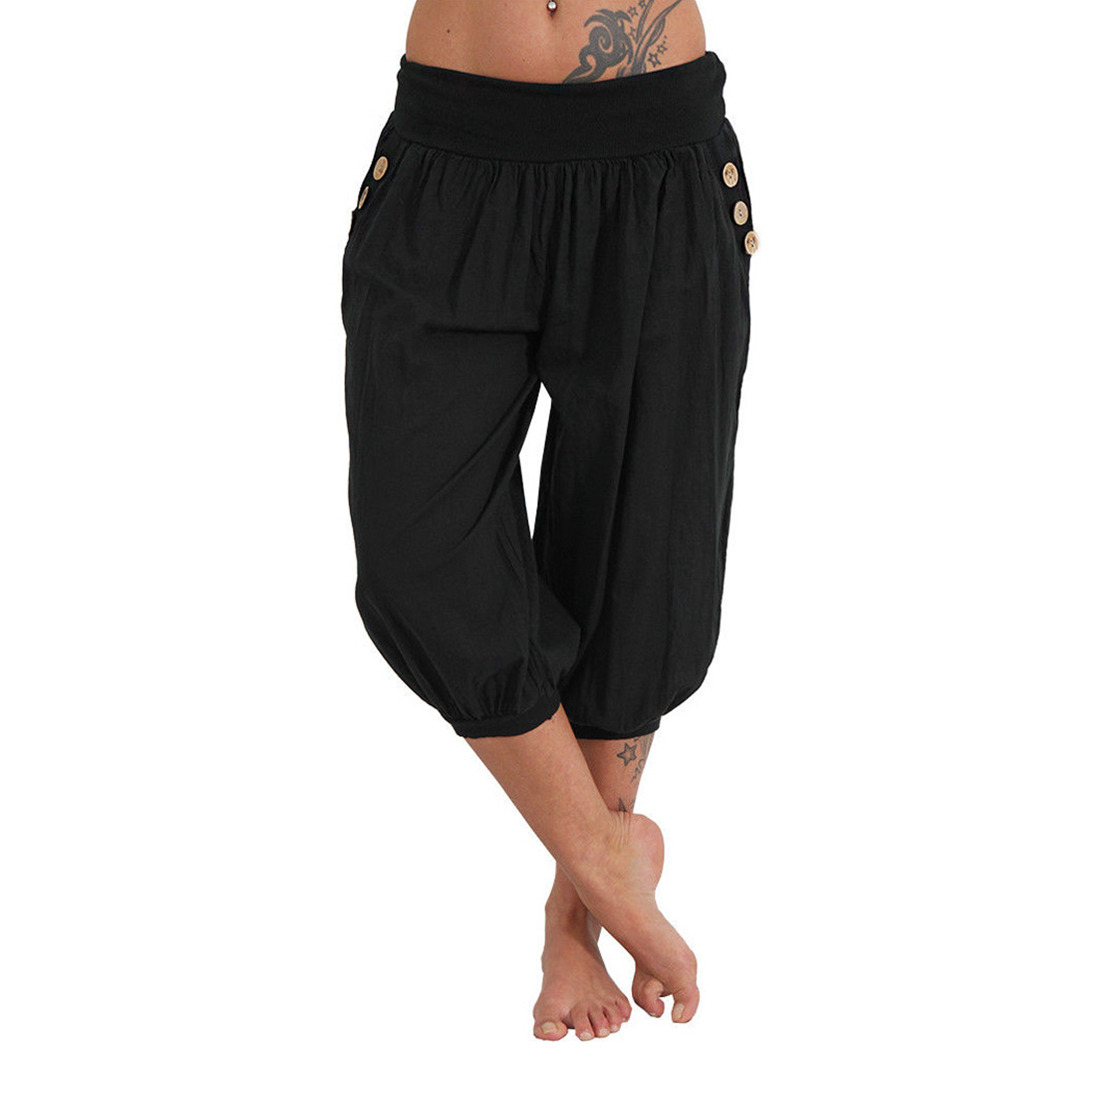 TFGS Women Solid Casual Loose   Pants   Low Waist Wide Leg   Pants     Capri     Pants   Trousers